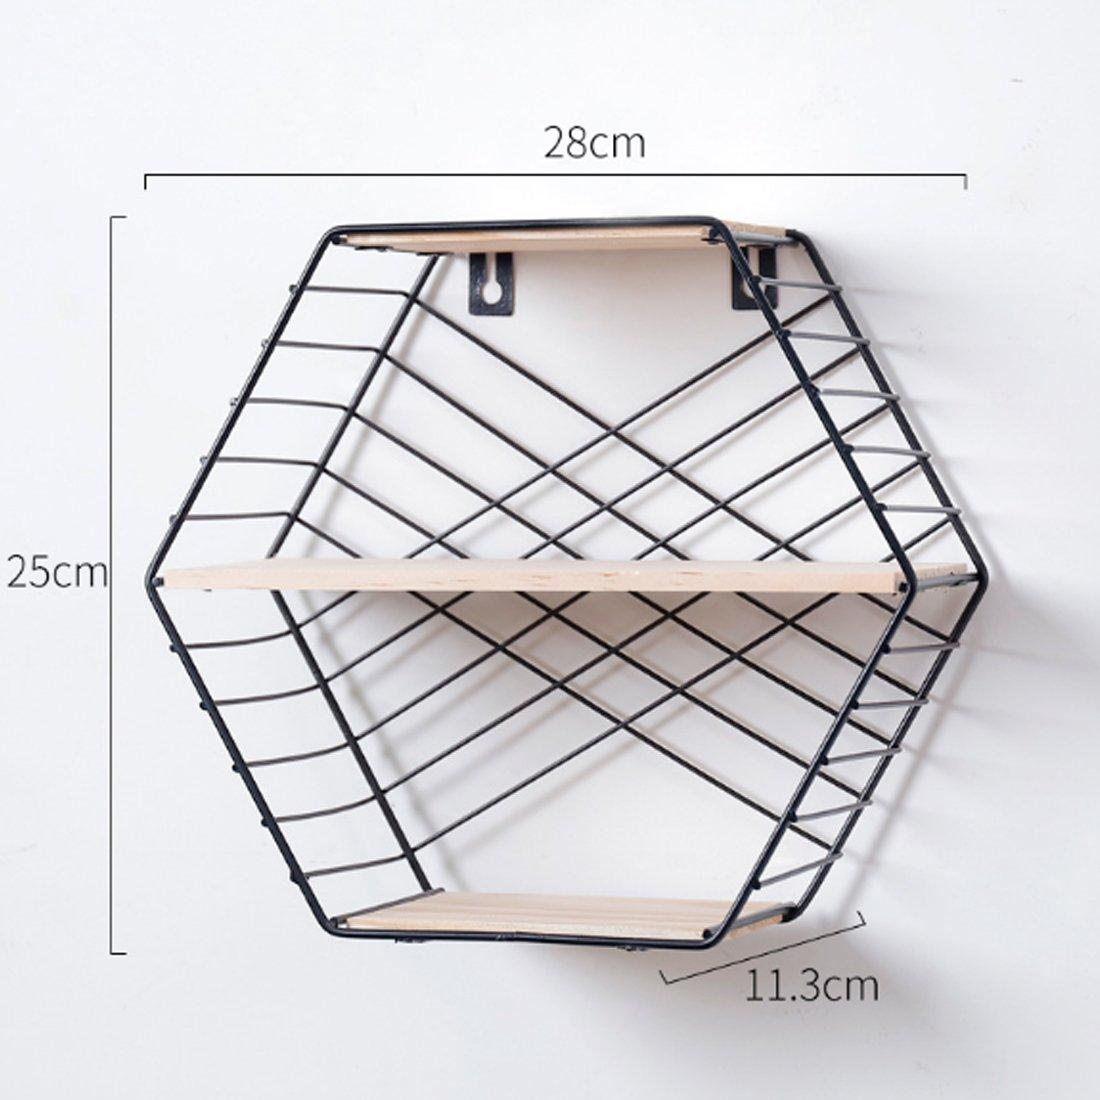 HMANE 3-Tier Wall Storage Rack,Decorative Hanging Hexagon Shelf Organizer for Kitchen,Bathroom,Office - Black by HMANE (Image #1)